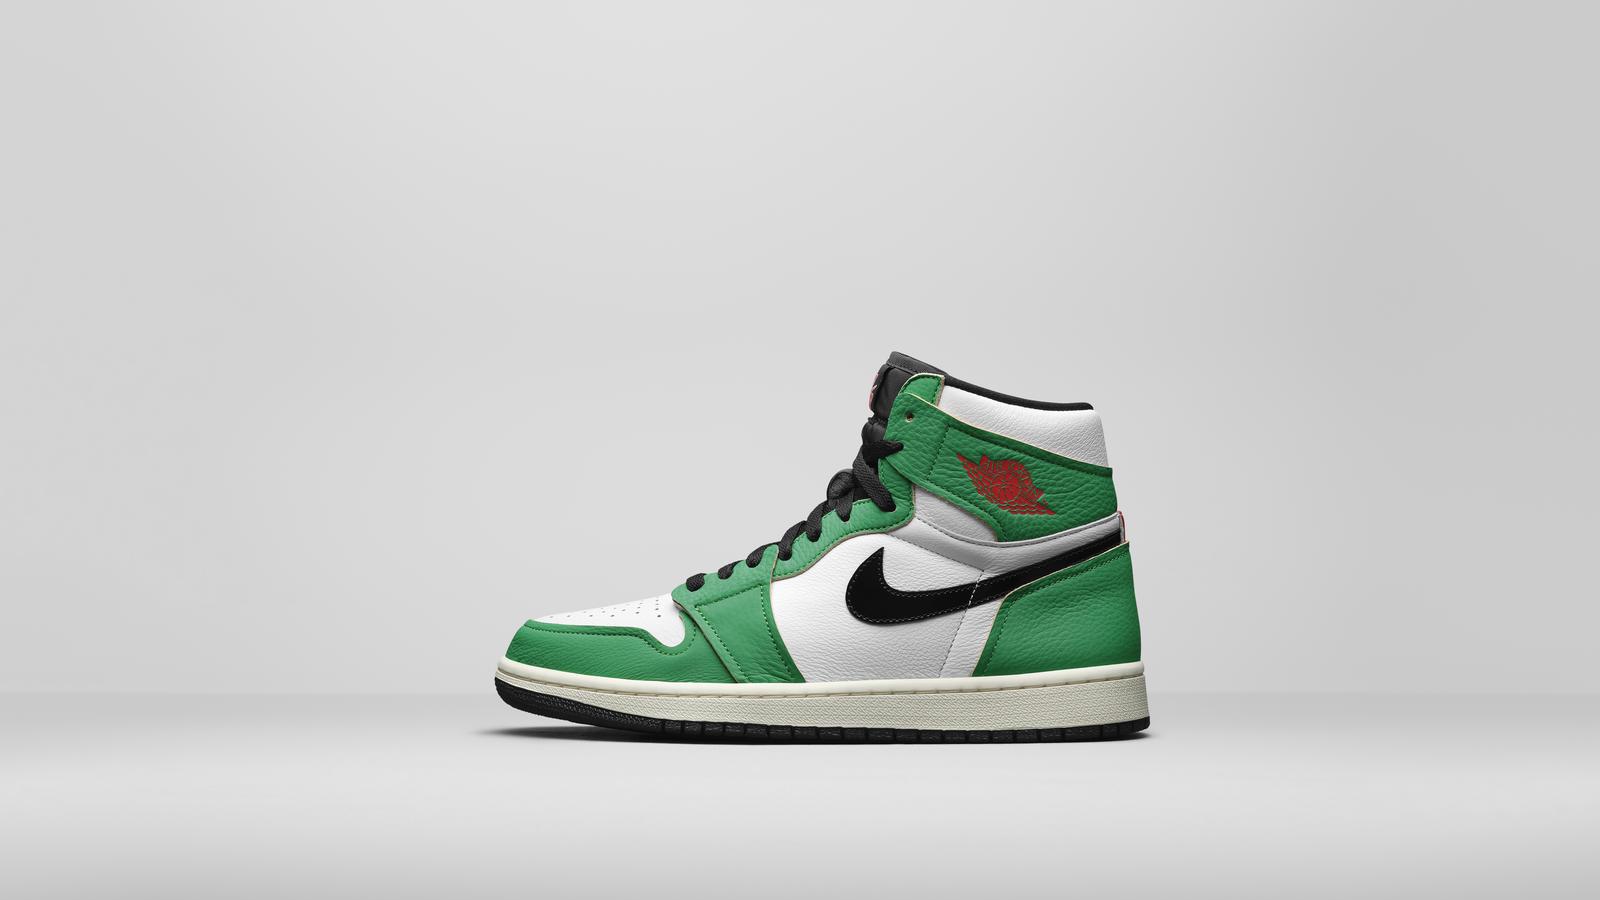 Jordan Brand Holiday 2020 Retro Releases - Nike News